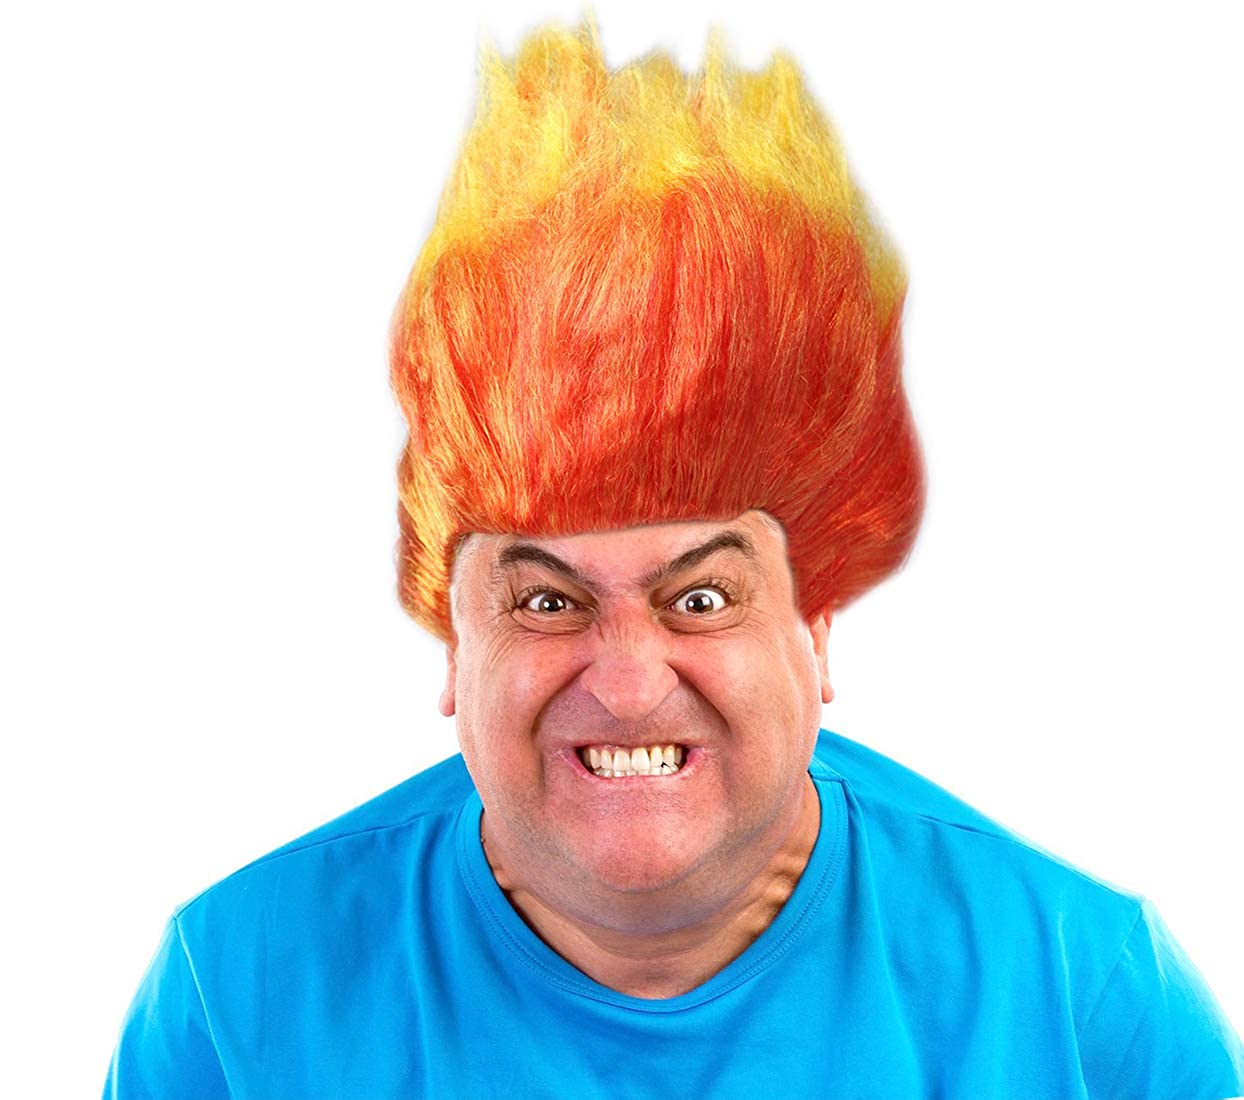 Amazon.com: Ira peluca disfraz de Ira peluca naranja y ...